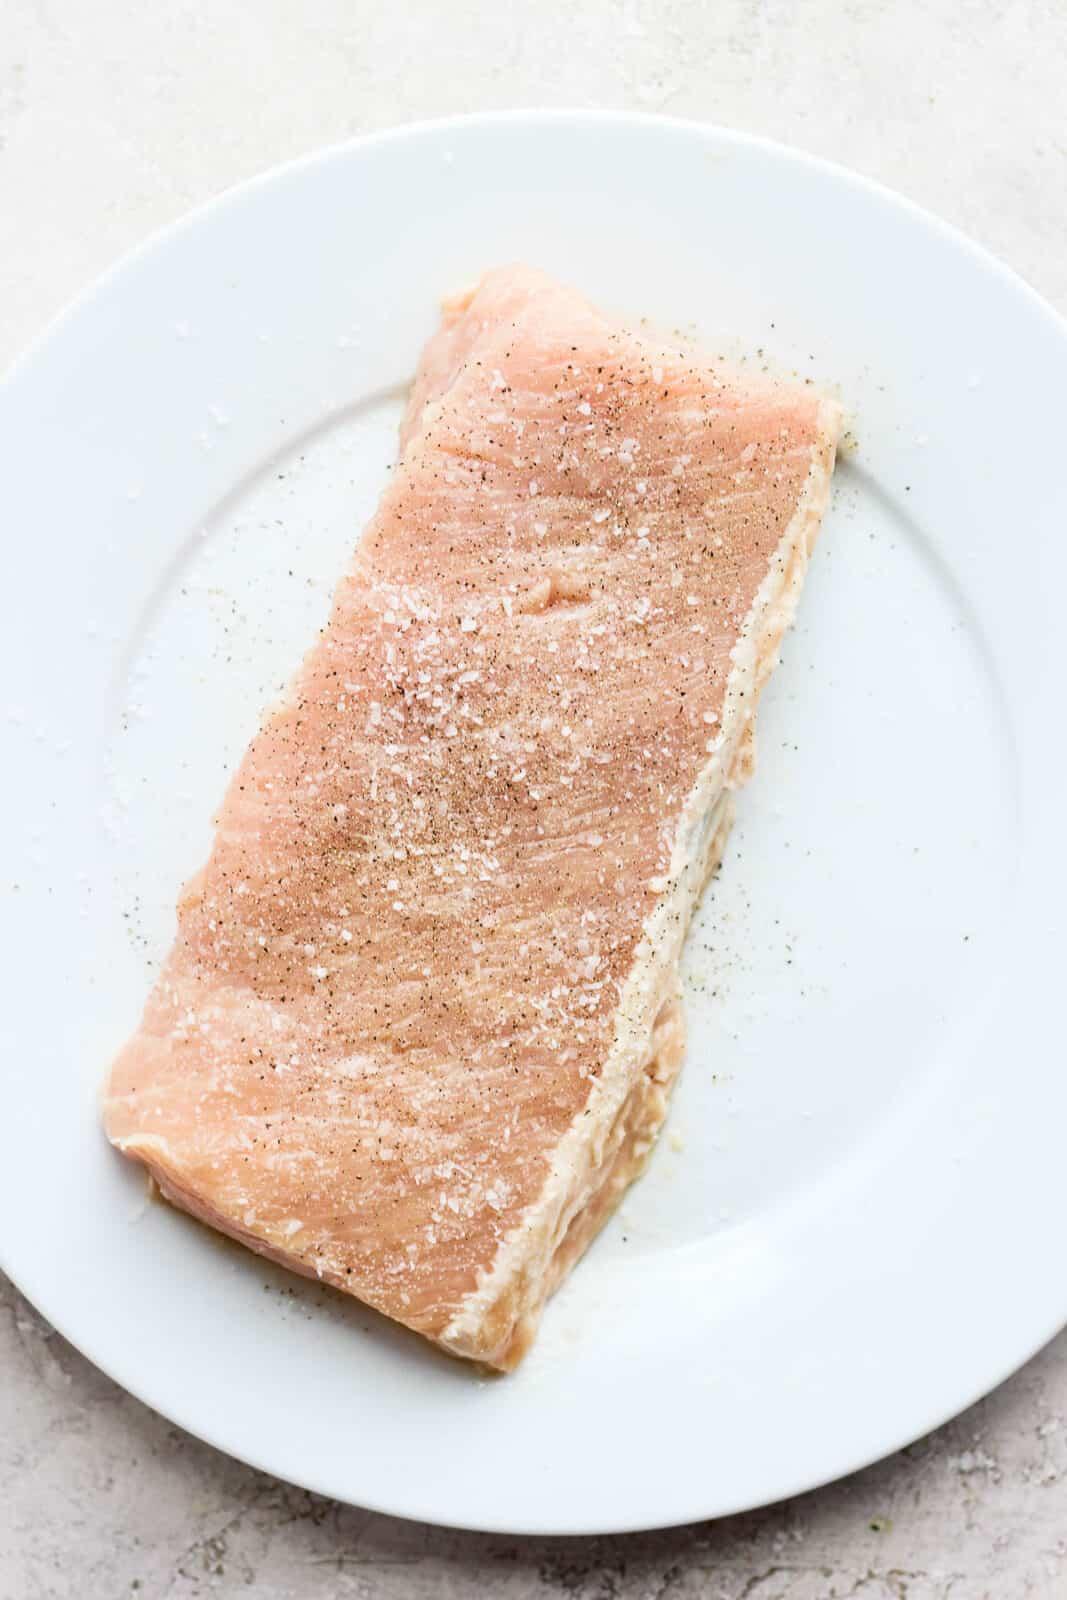 A raw pork loin seasoned with salt and pepper.